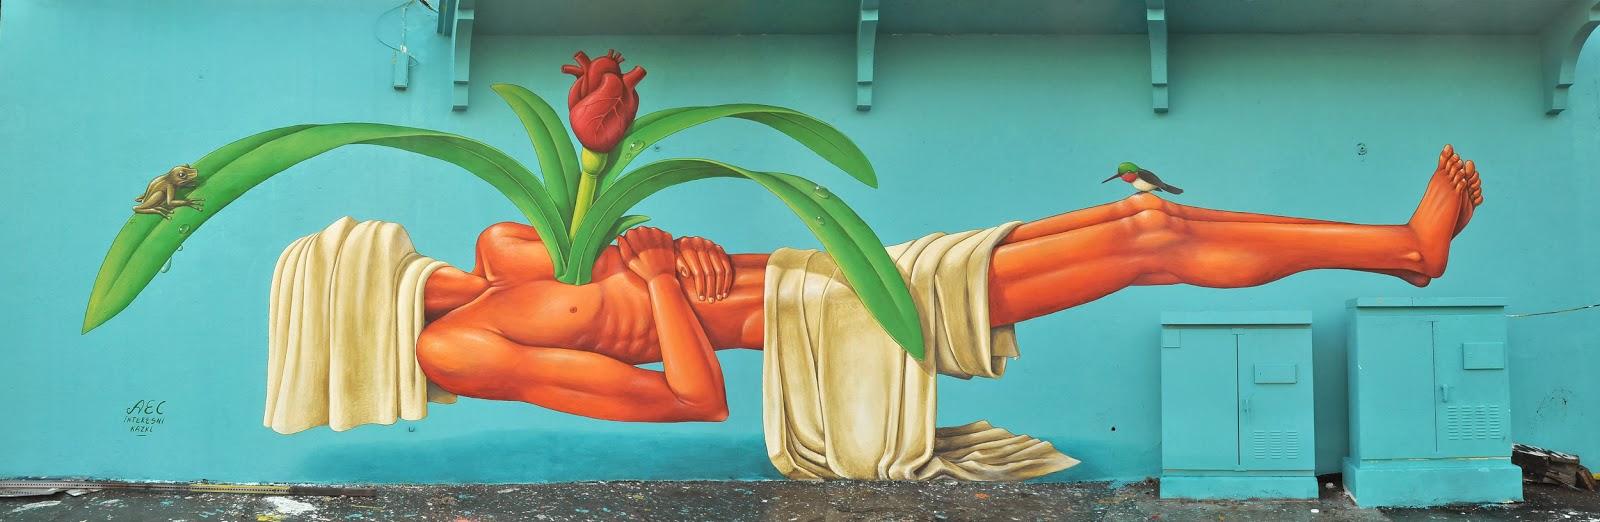 interesni-kazki-new-mural-los-muros-hablan-01